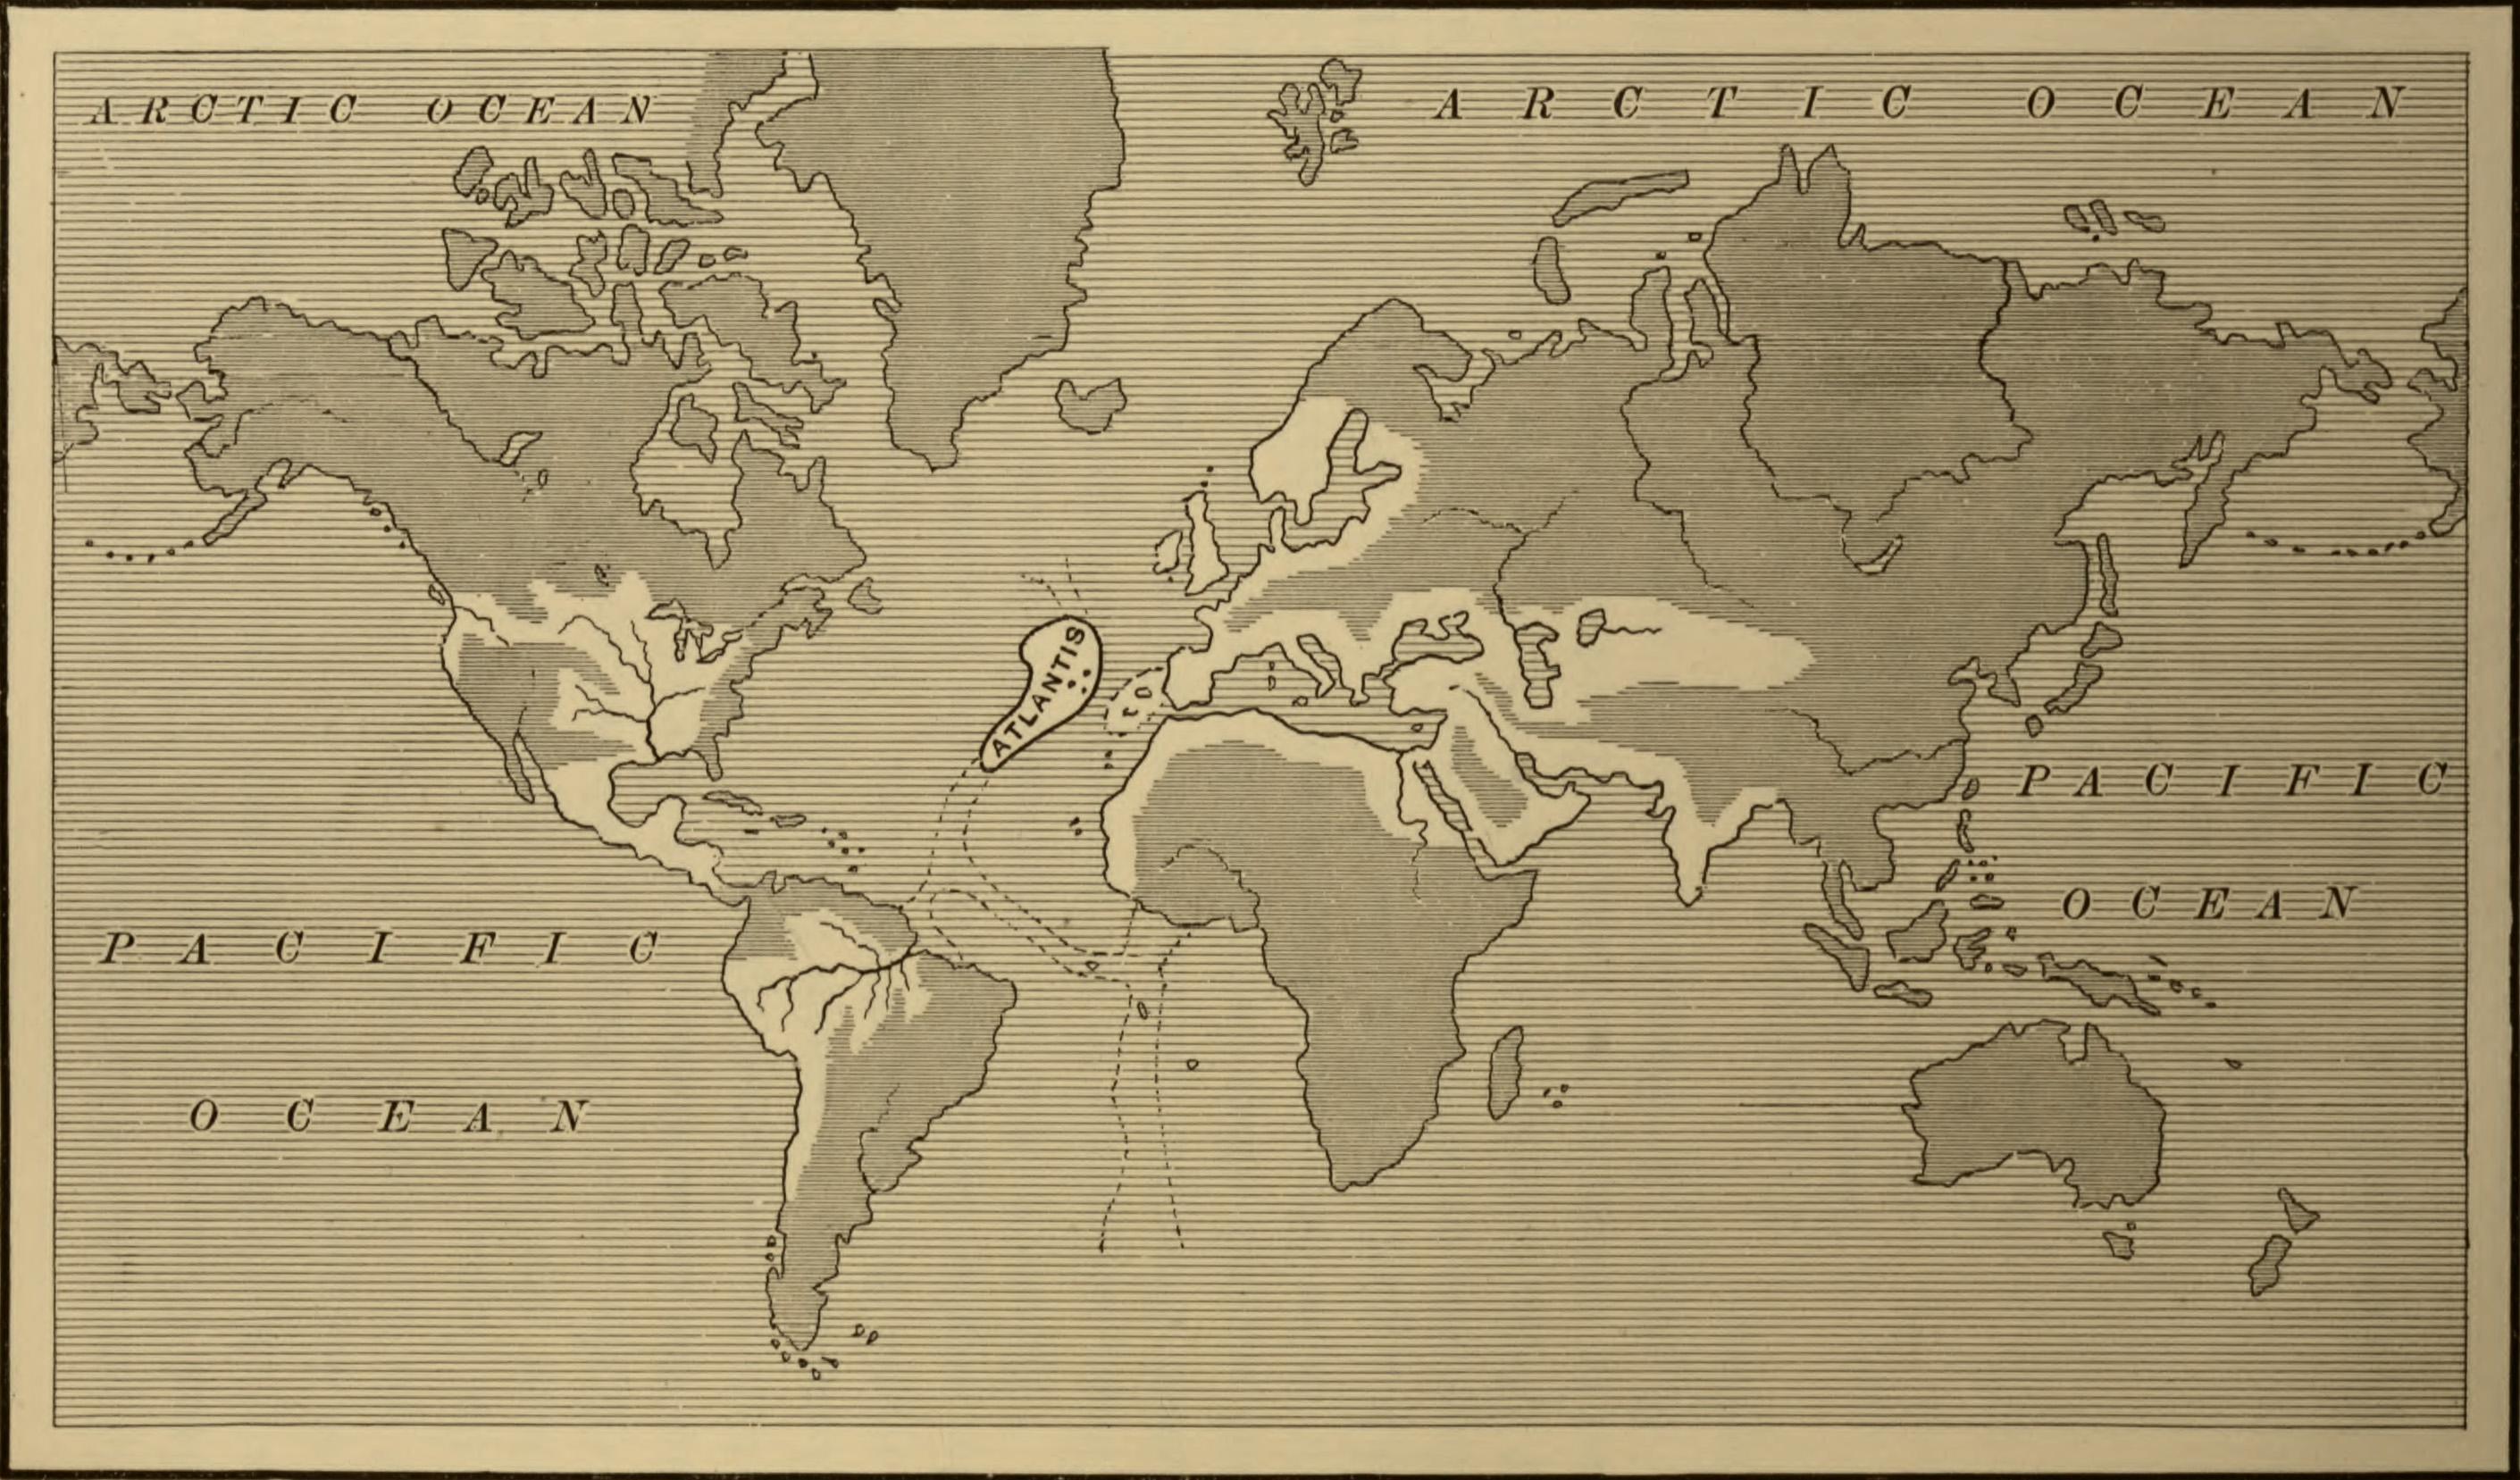 Atlantis_map_1882_crop.jpg